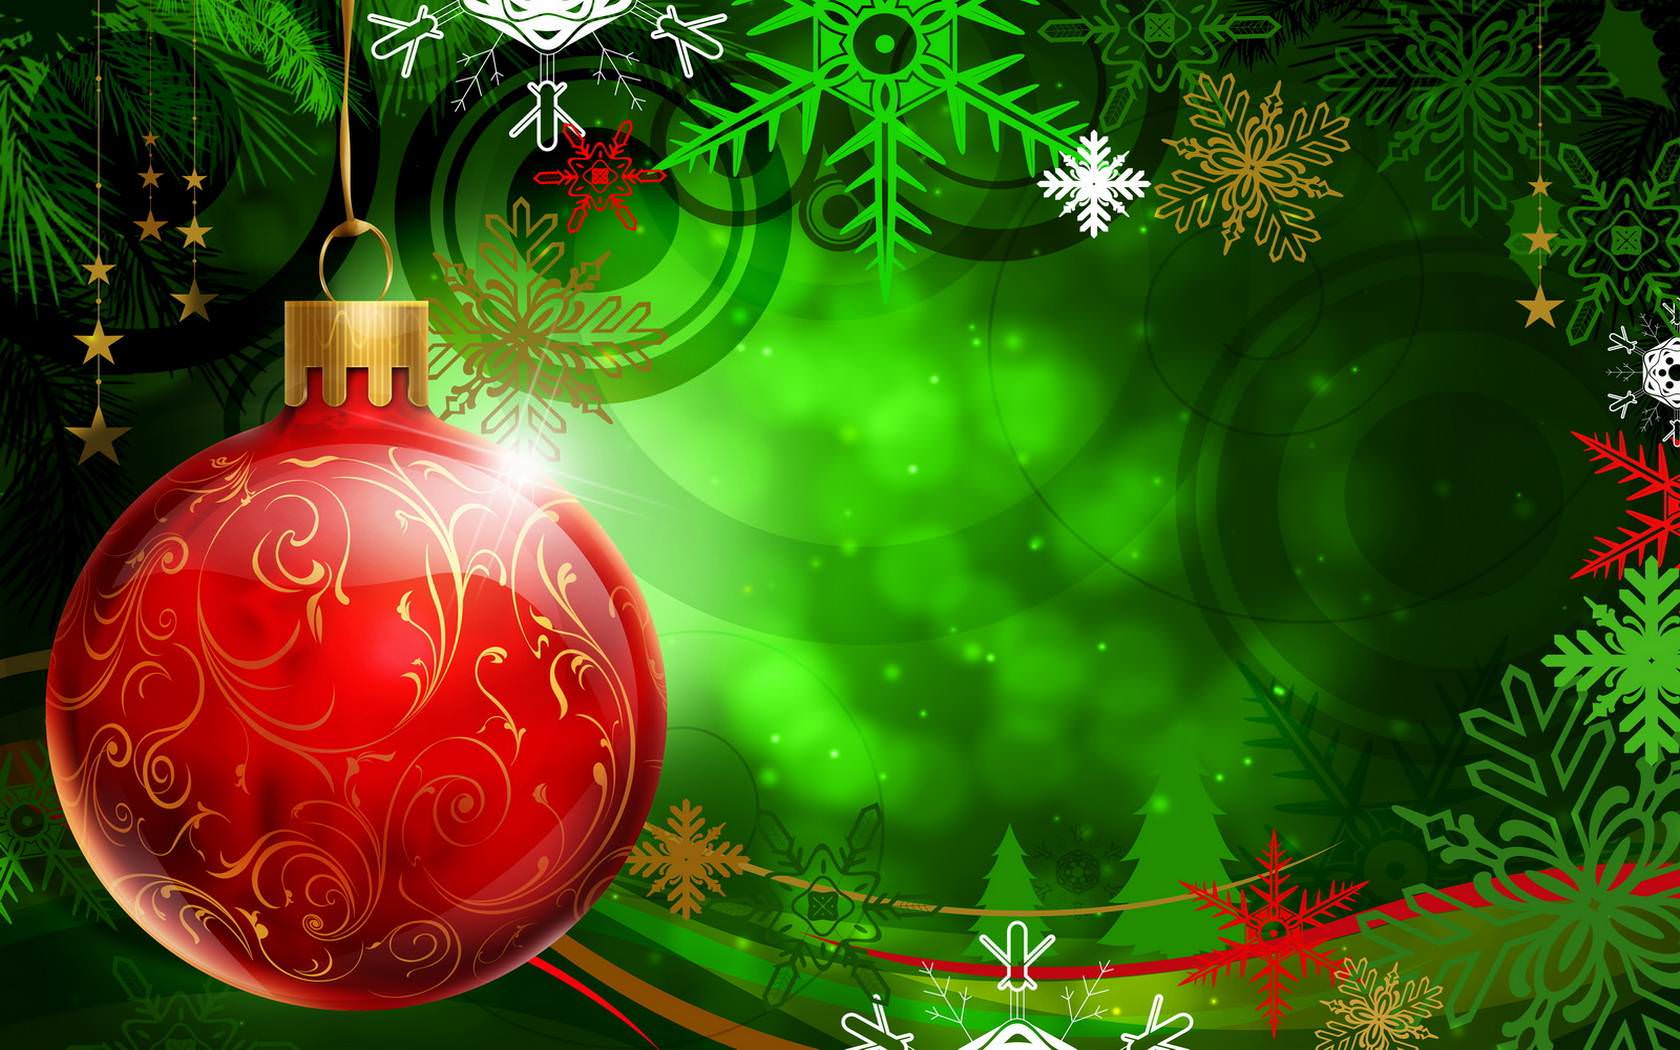 Wallpaper Christmas.High Resolution Christmas Wallpapers Top Free High